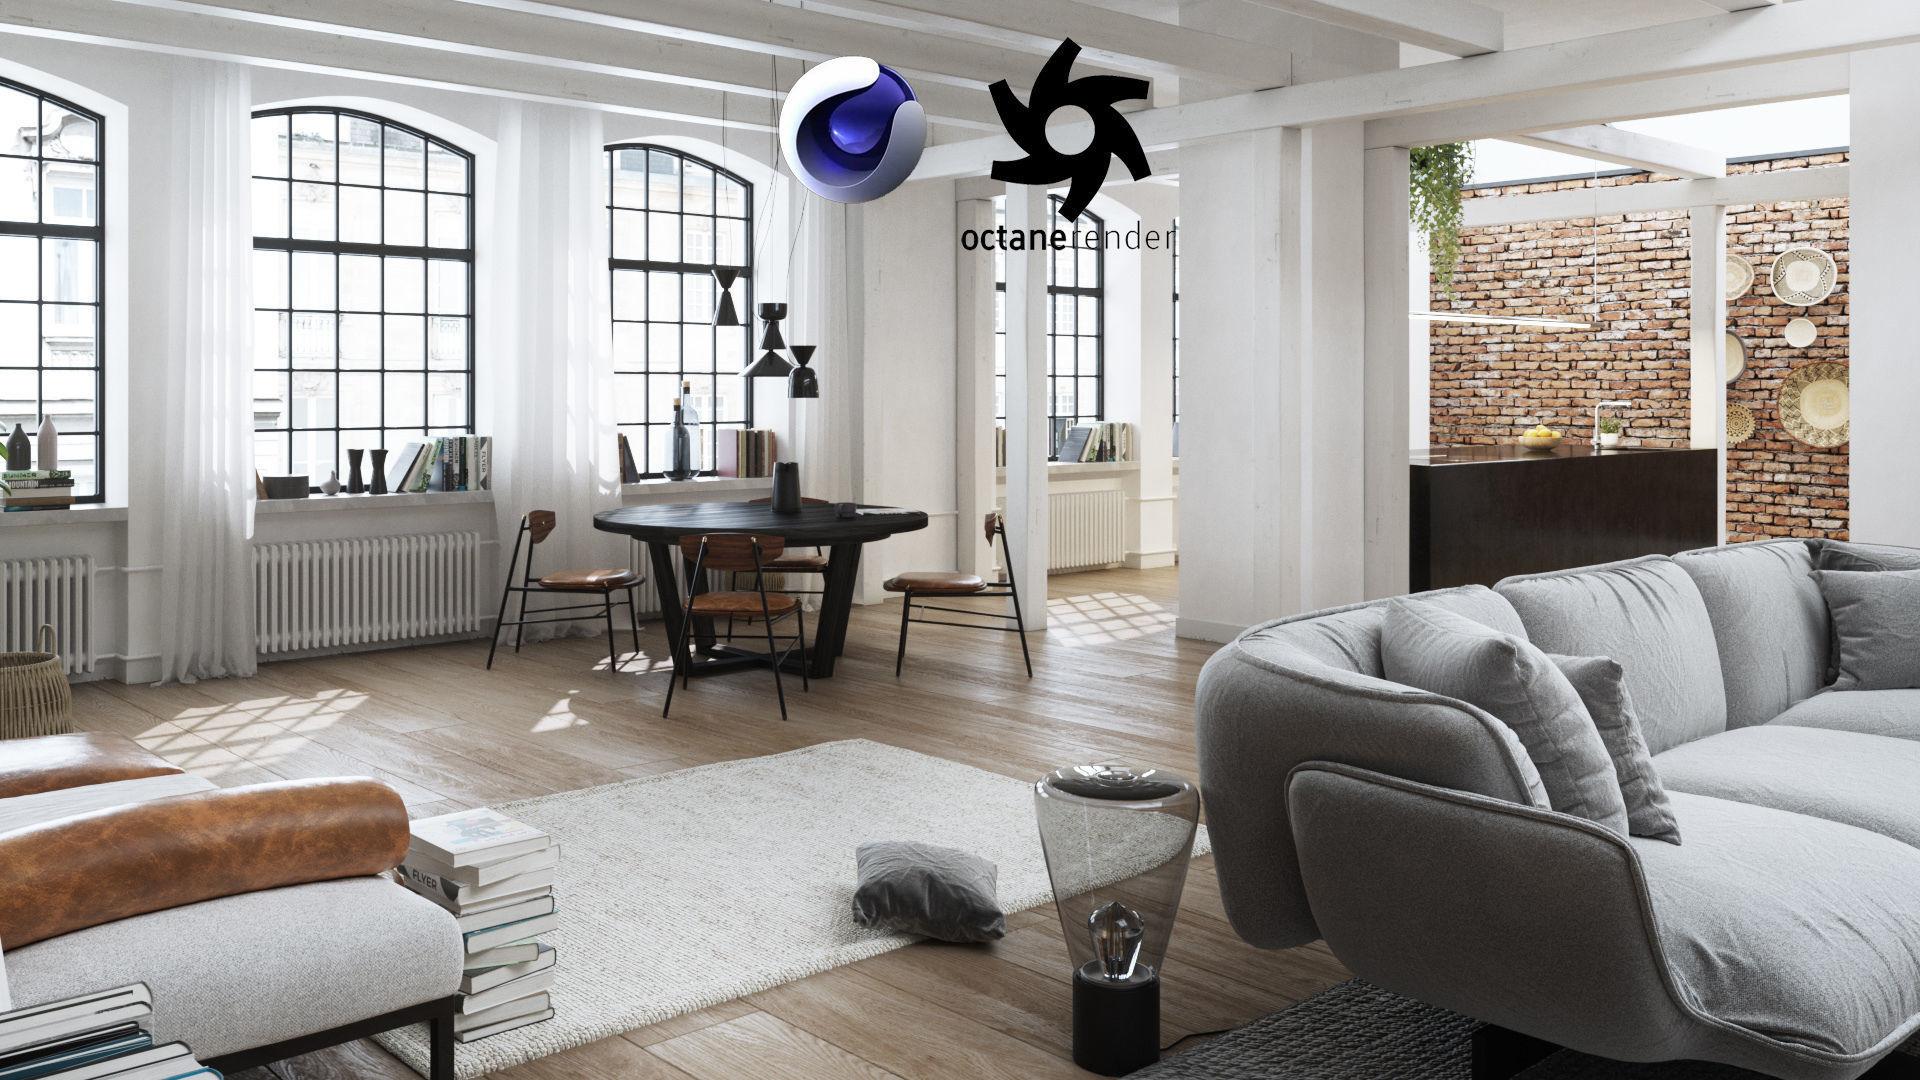 Workshop Apartment in London Cinema 4D and Octane Render